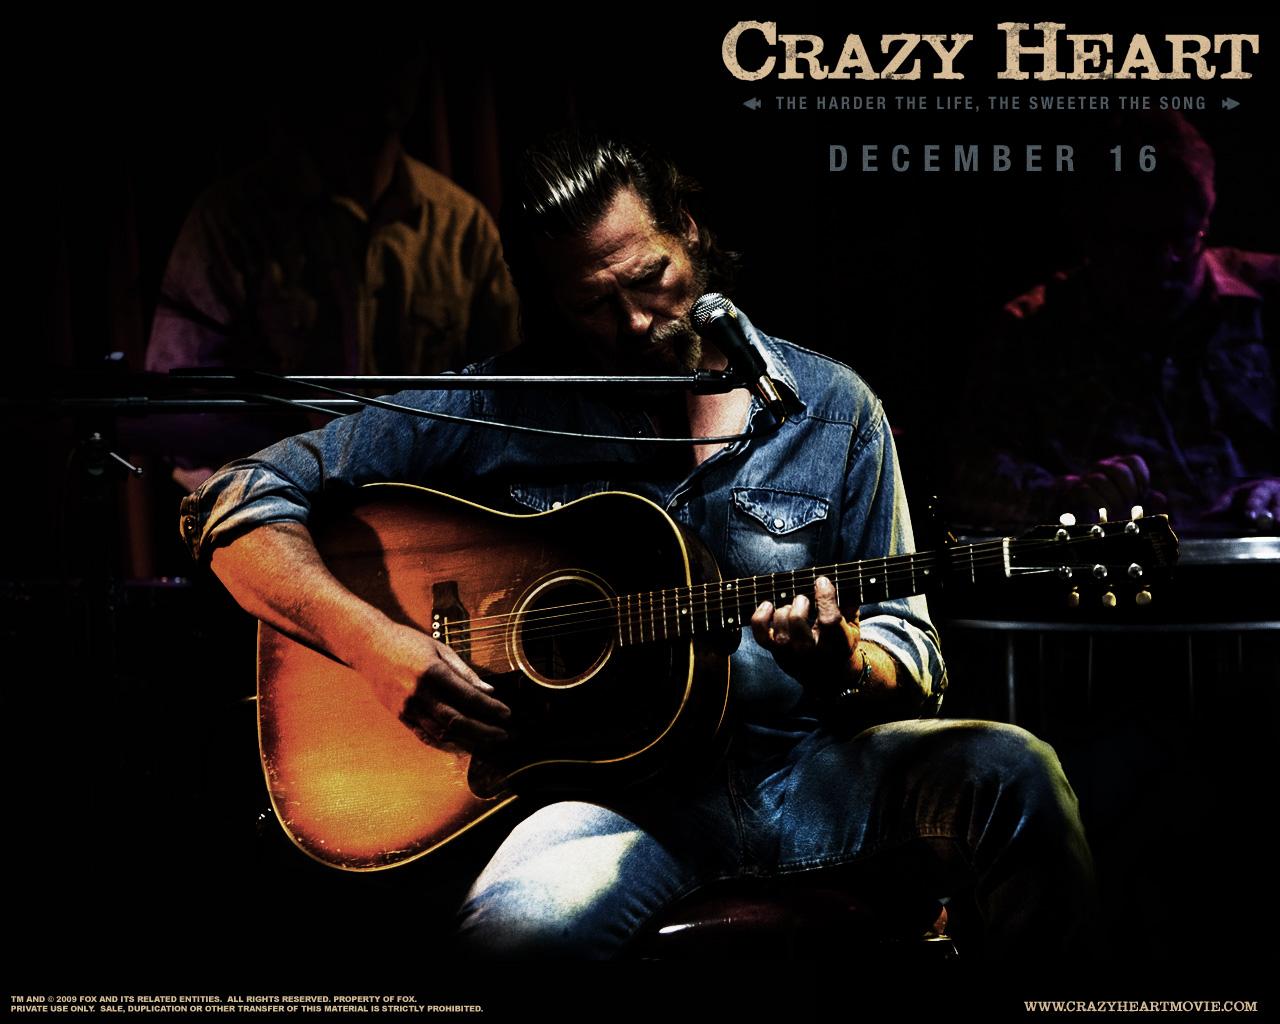 http://3.bp.blogspot.com/-JxH9XA1mzxc/TncYRR0iX3I/AAAAAAAADCk/8-ADT7wJ5CM/s1600/crazy-heart-002.jpg